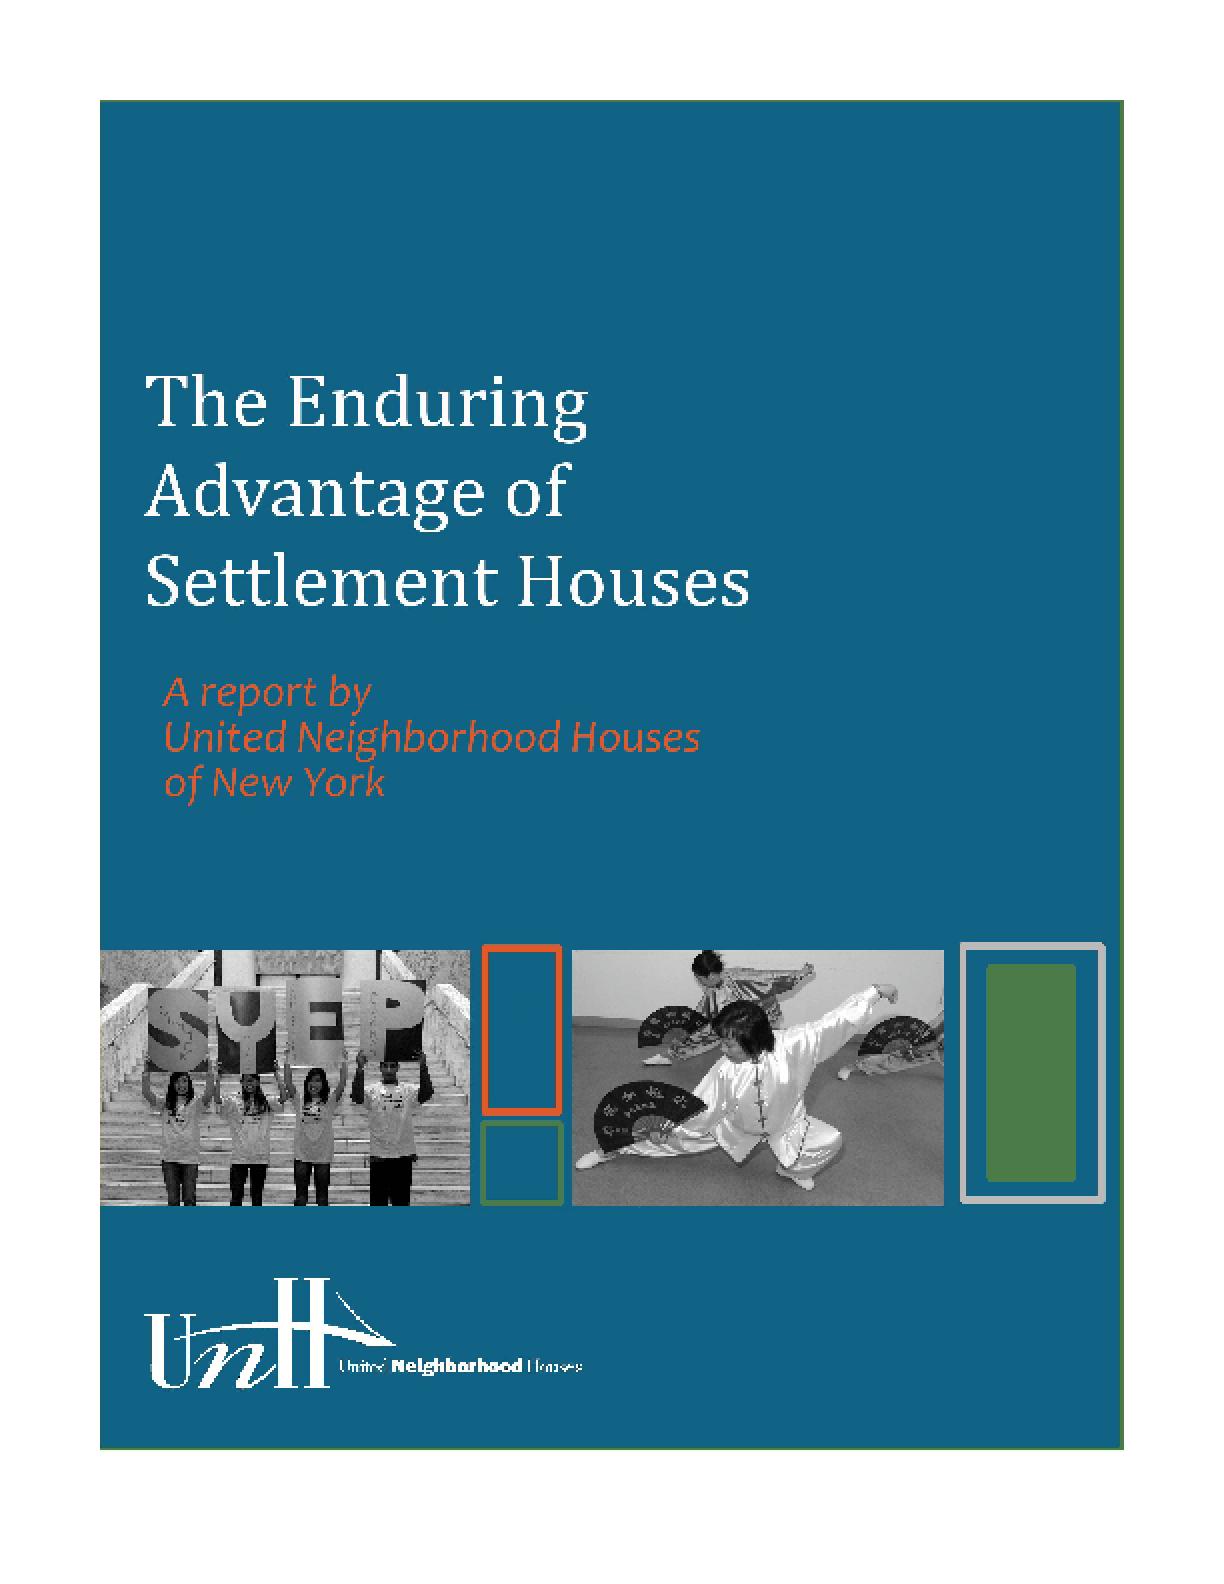 Enduring Advantage of Settlement Houses